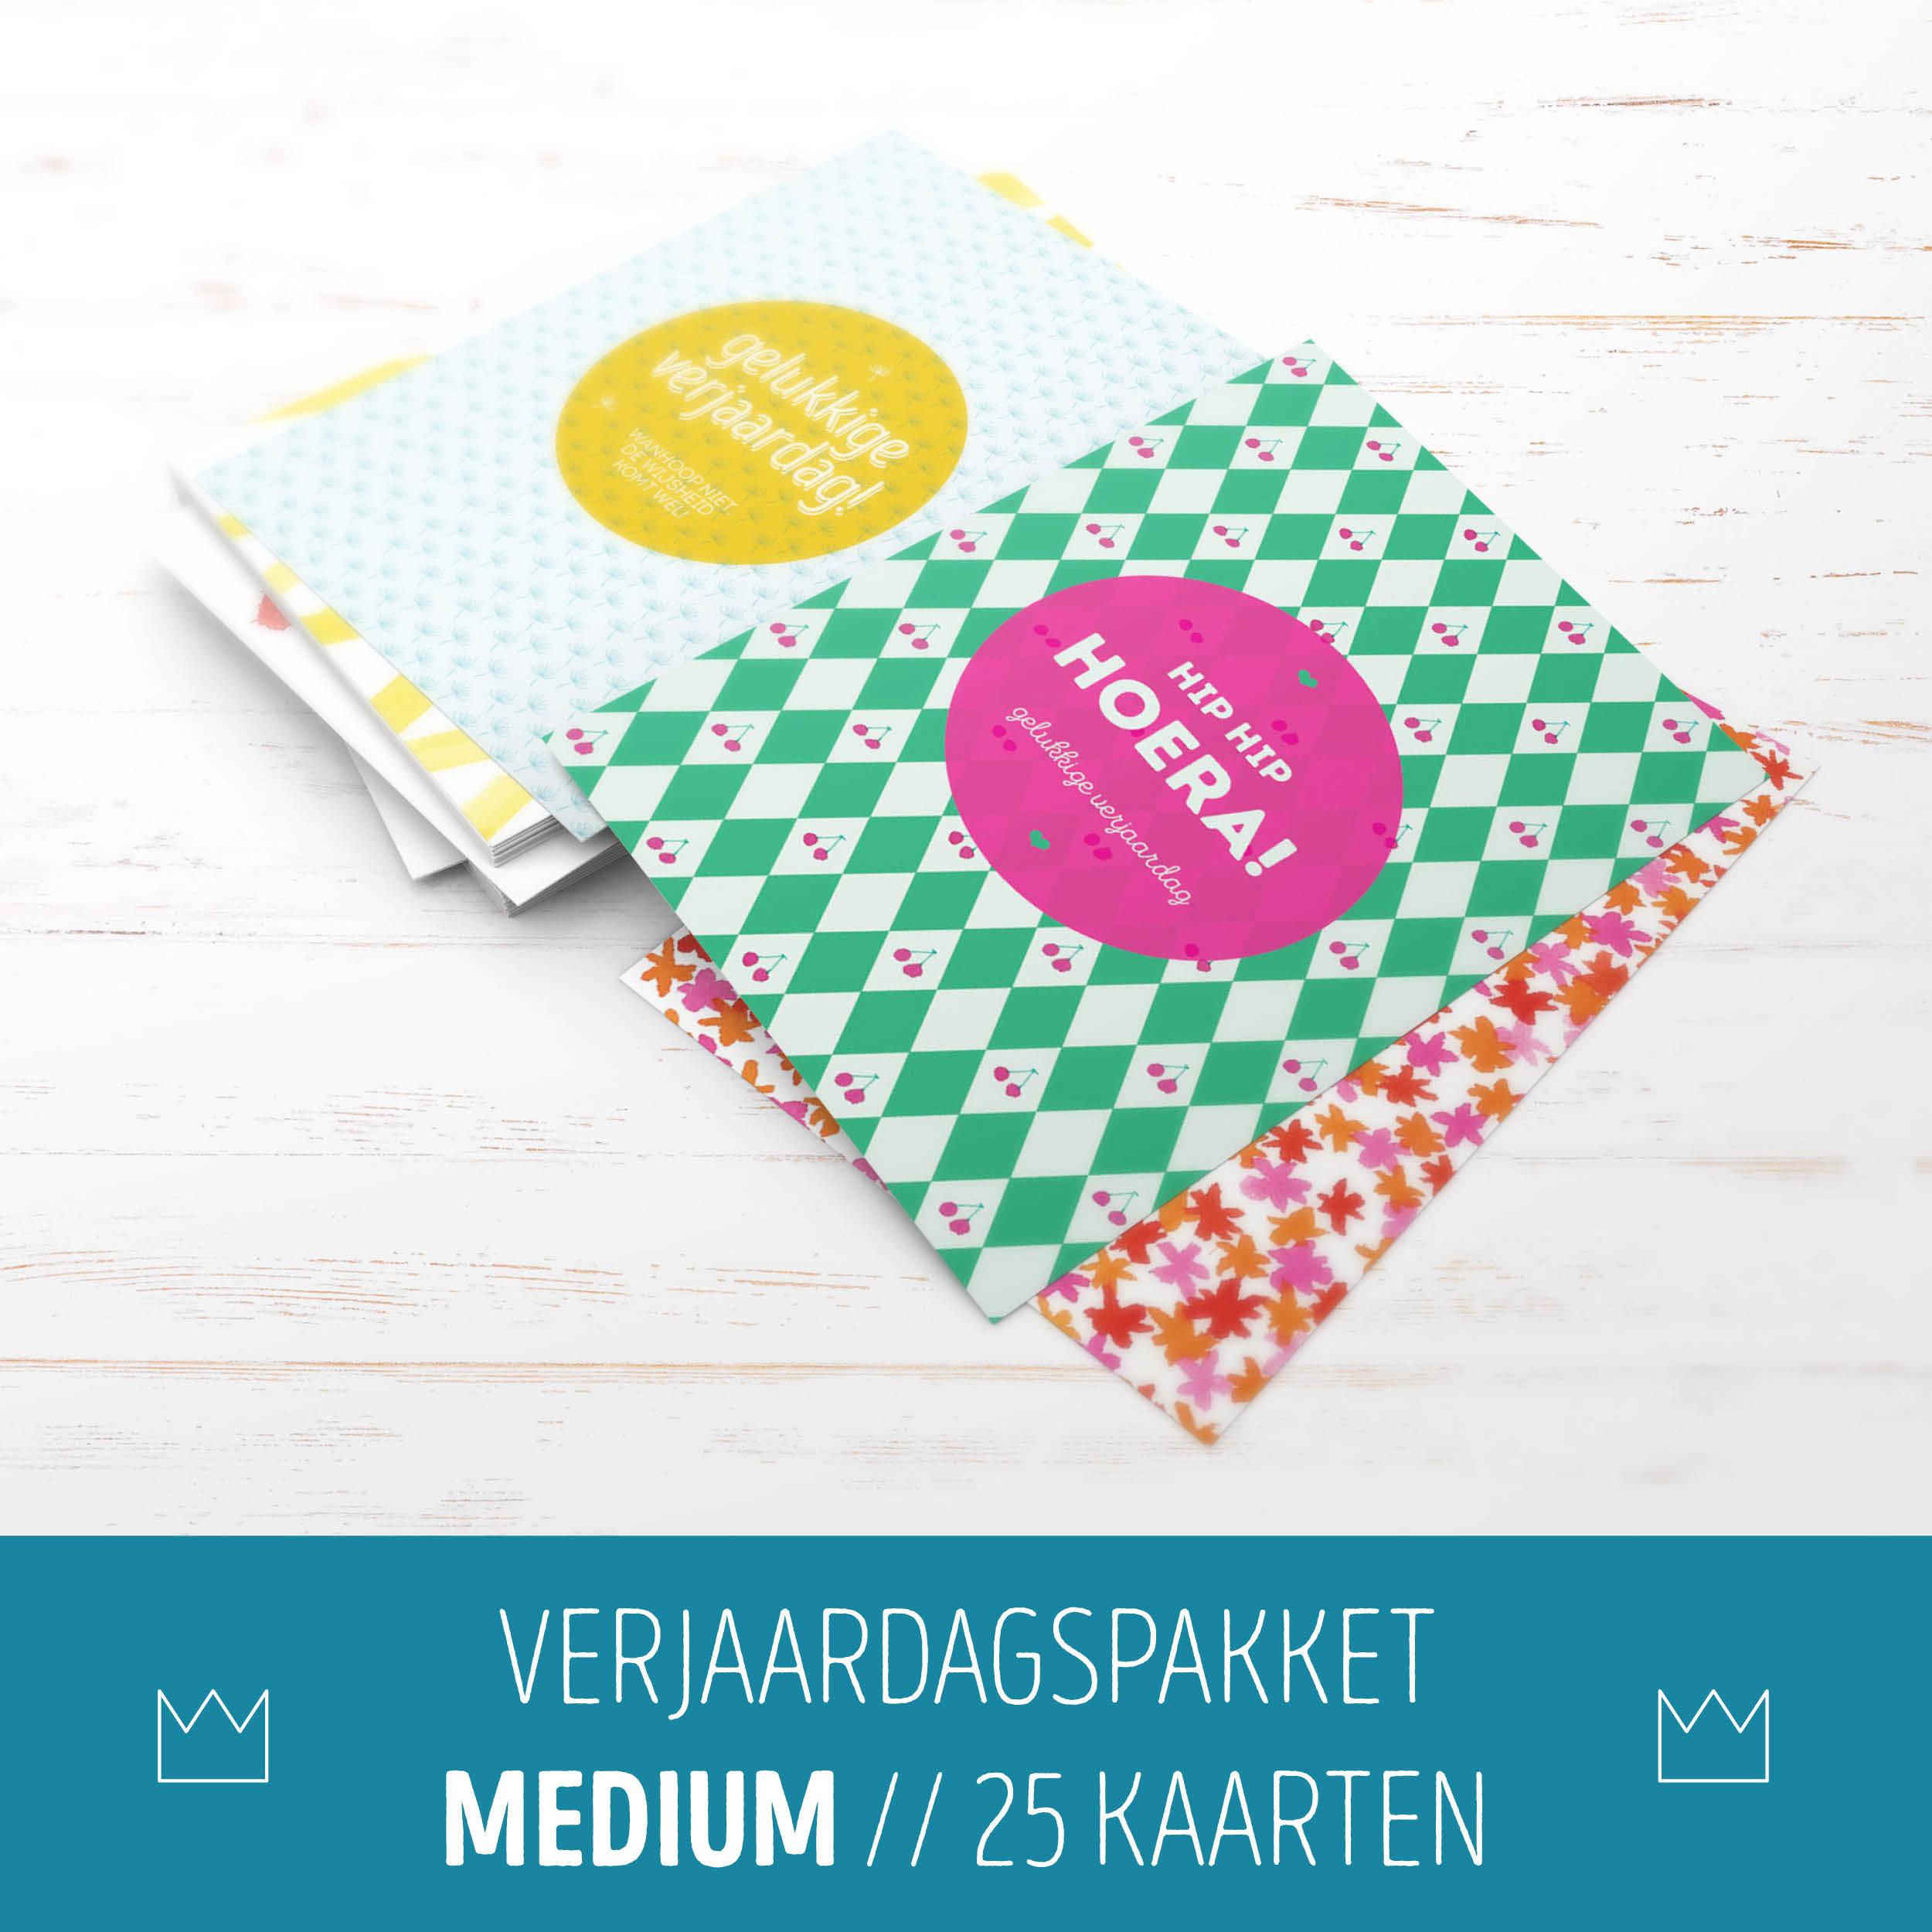 Verjaardagspakket Medium // 25 kaarten